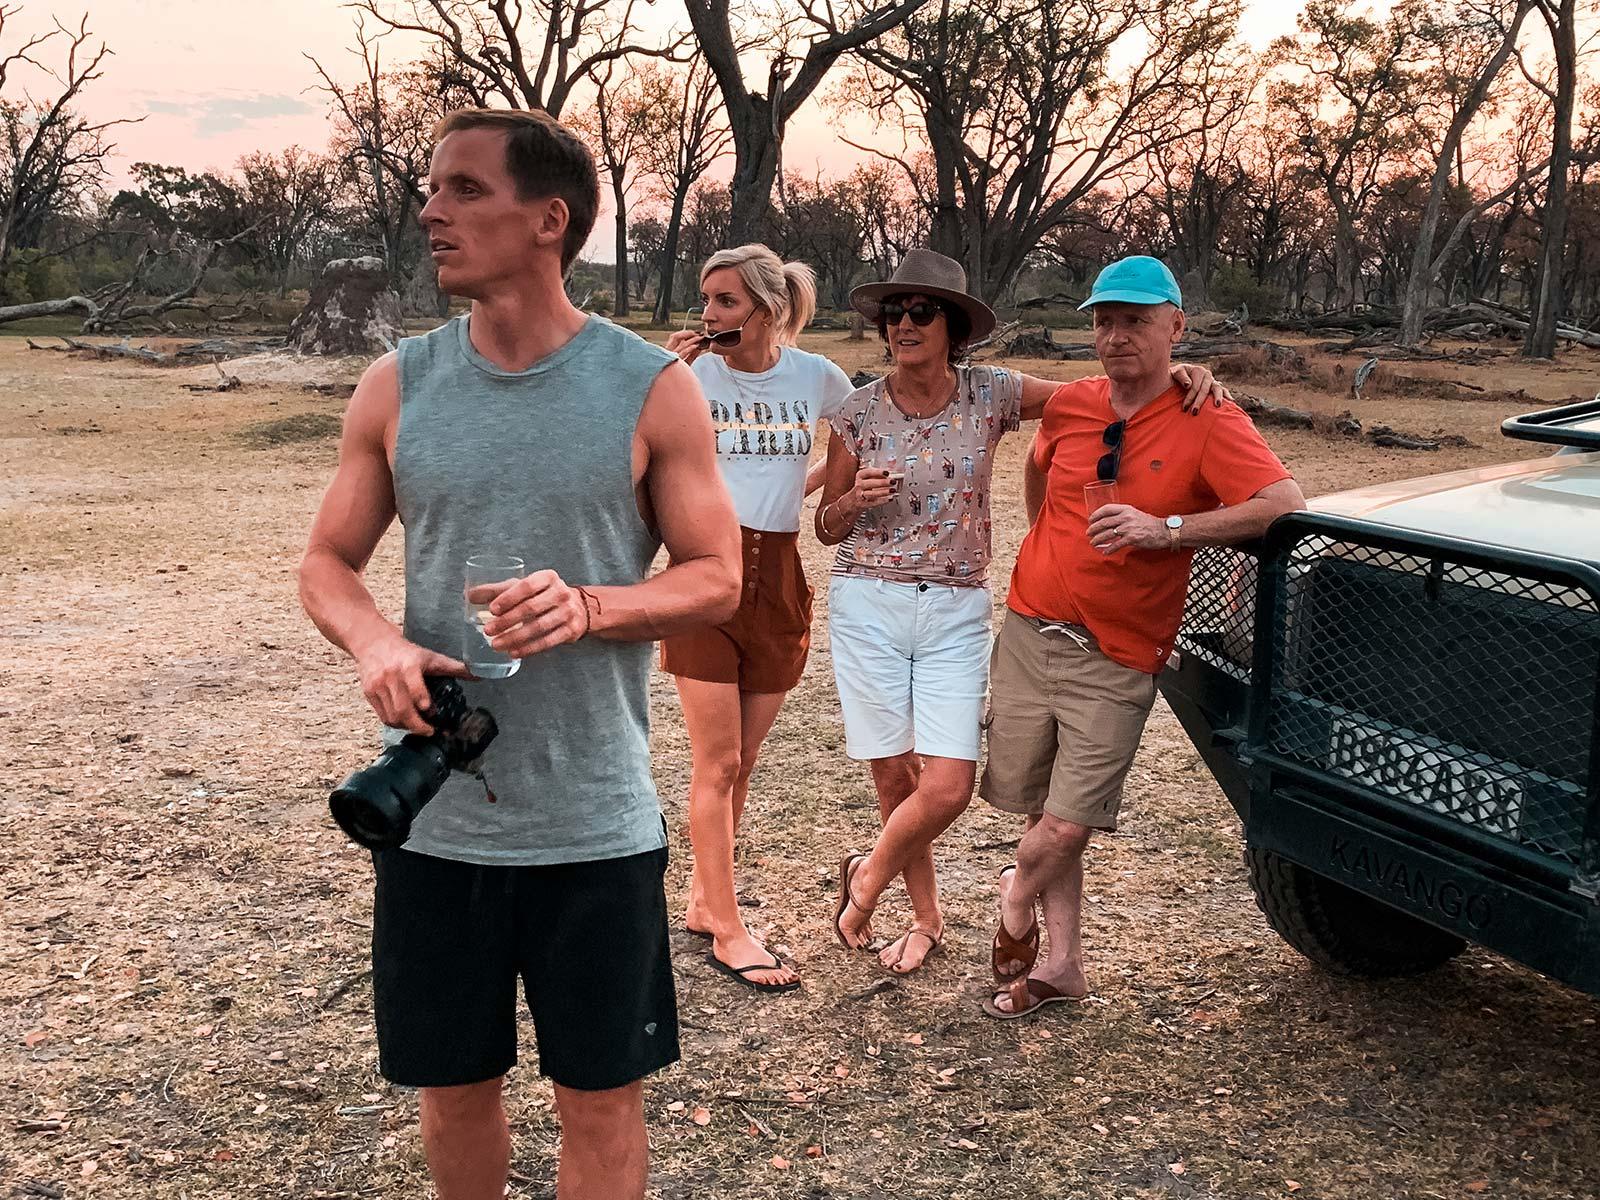 David Simpson and family in Botswana, Africa. A wild dog ambush